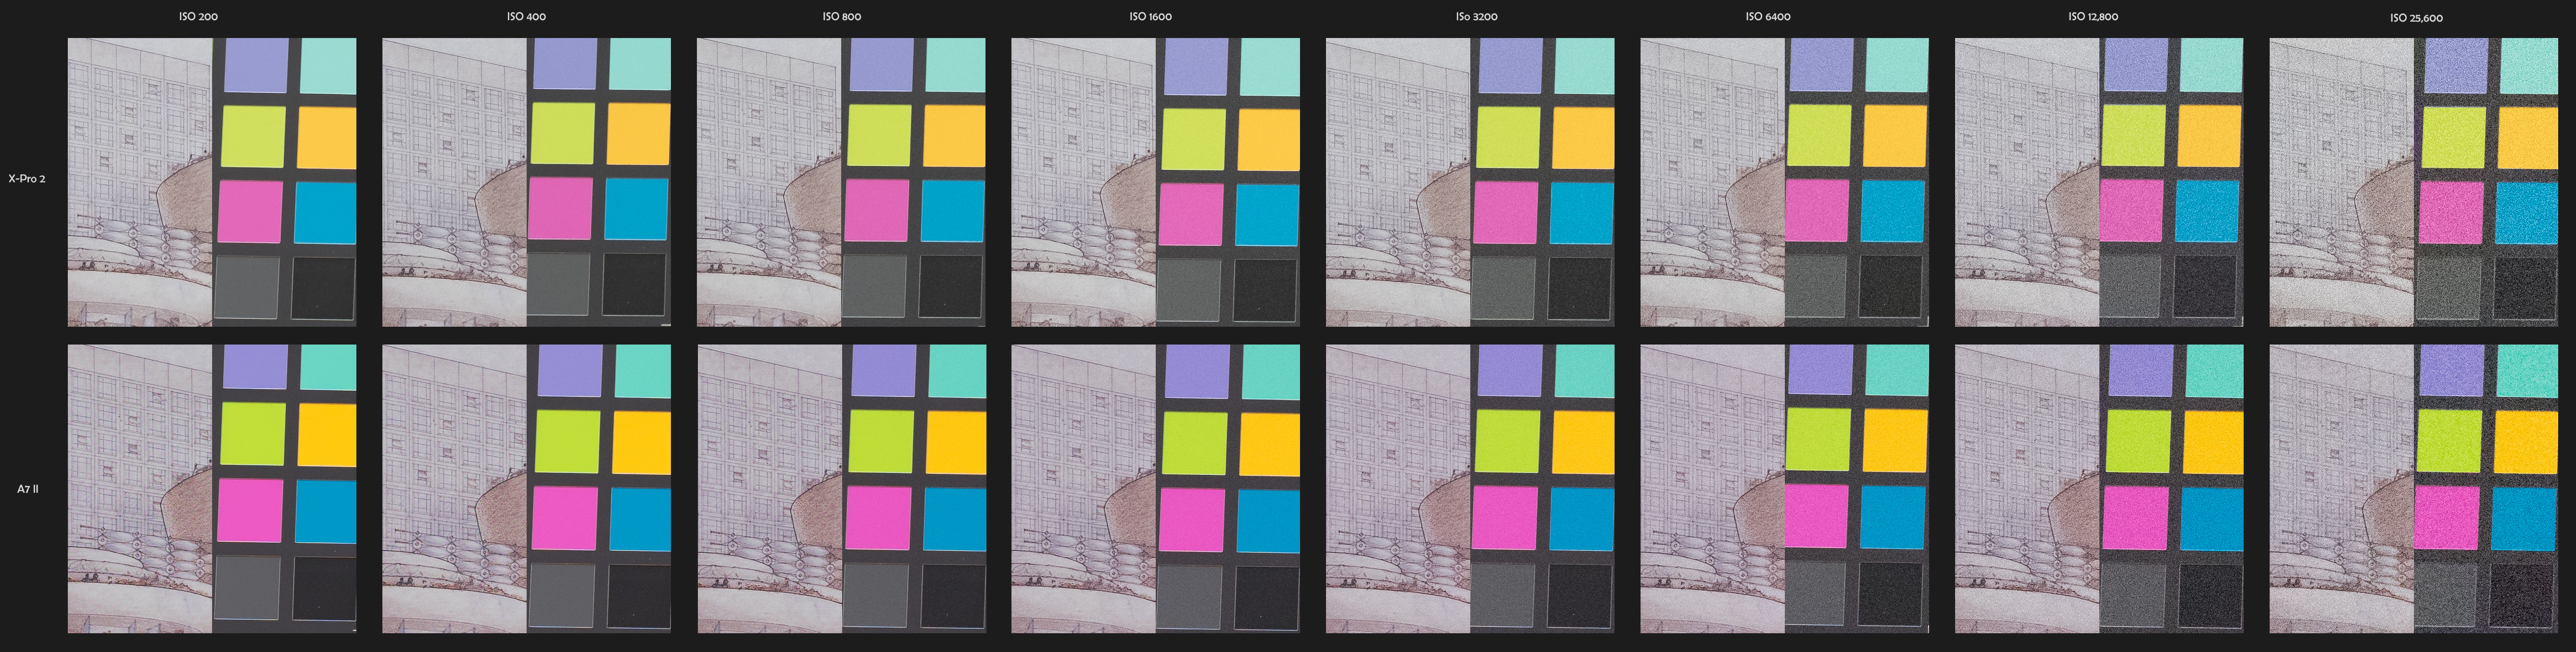 Fuji X-Pro 2 vs  Sony A7 II: Noise Comparison - Admiring Light